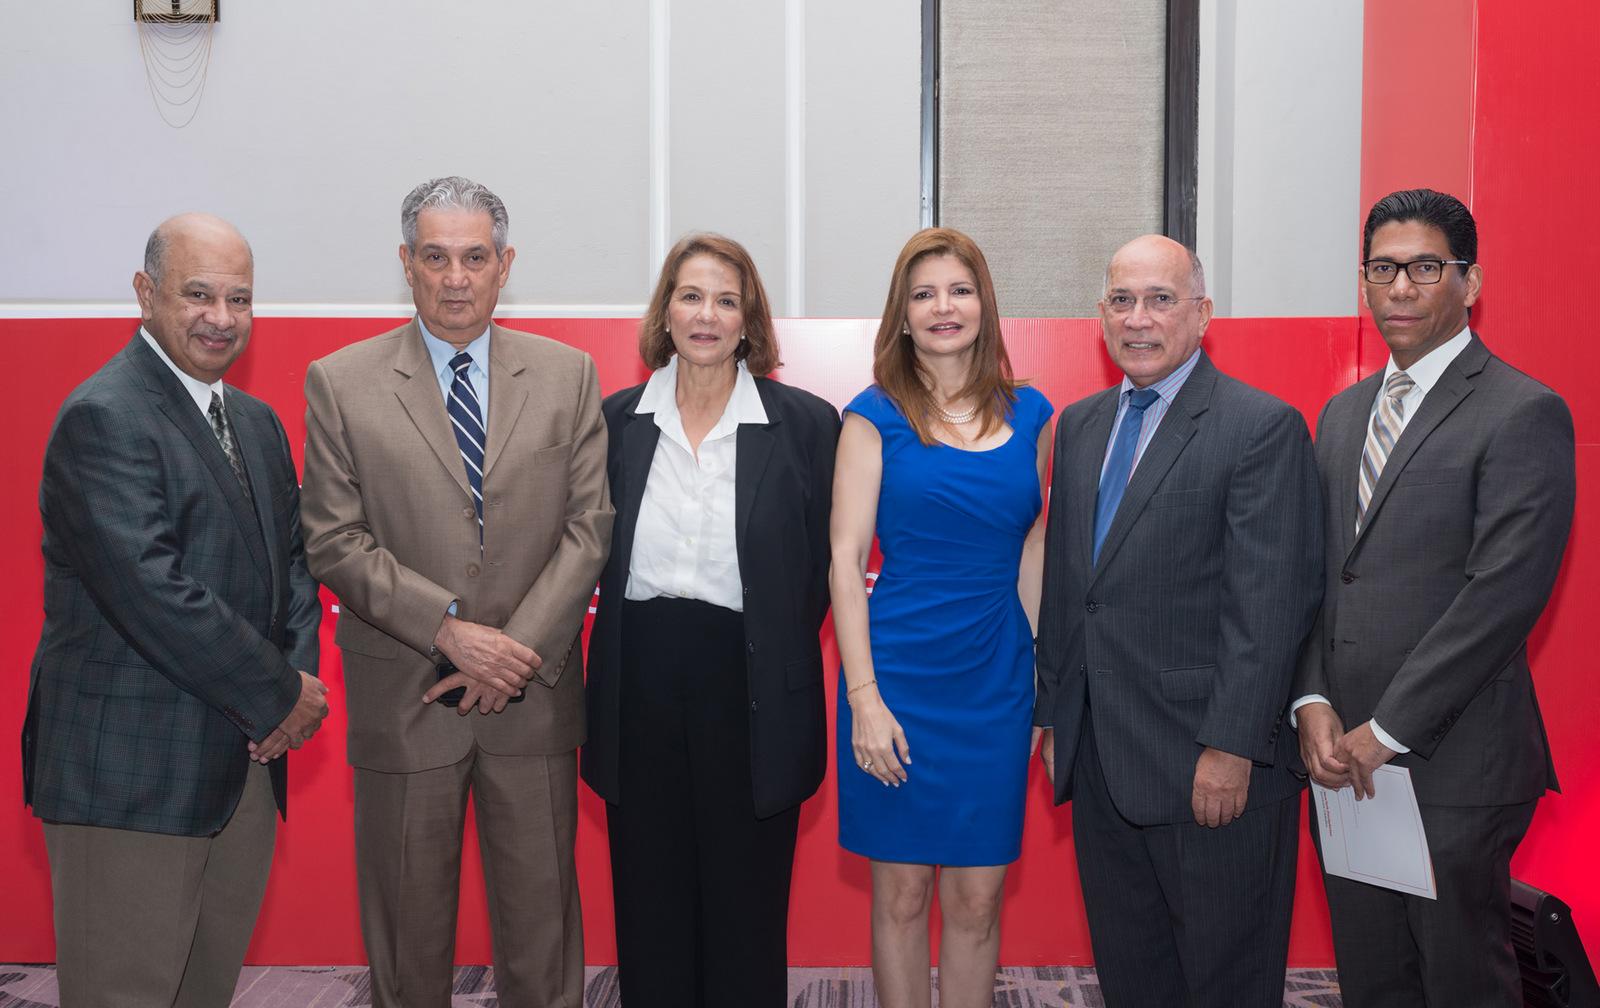 foto 14.Rafael A. Lantigua, Jose Puello, Tamara Frankenberg, Nancy Velazquez de Florentino, Luis Canela y Jose de Jesus